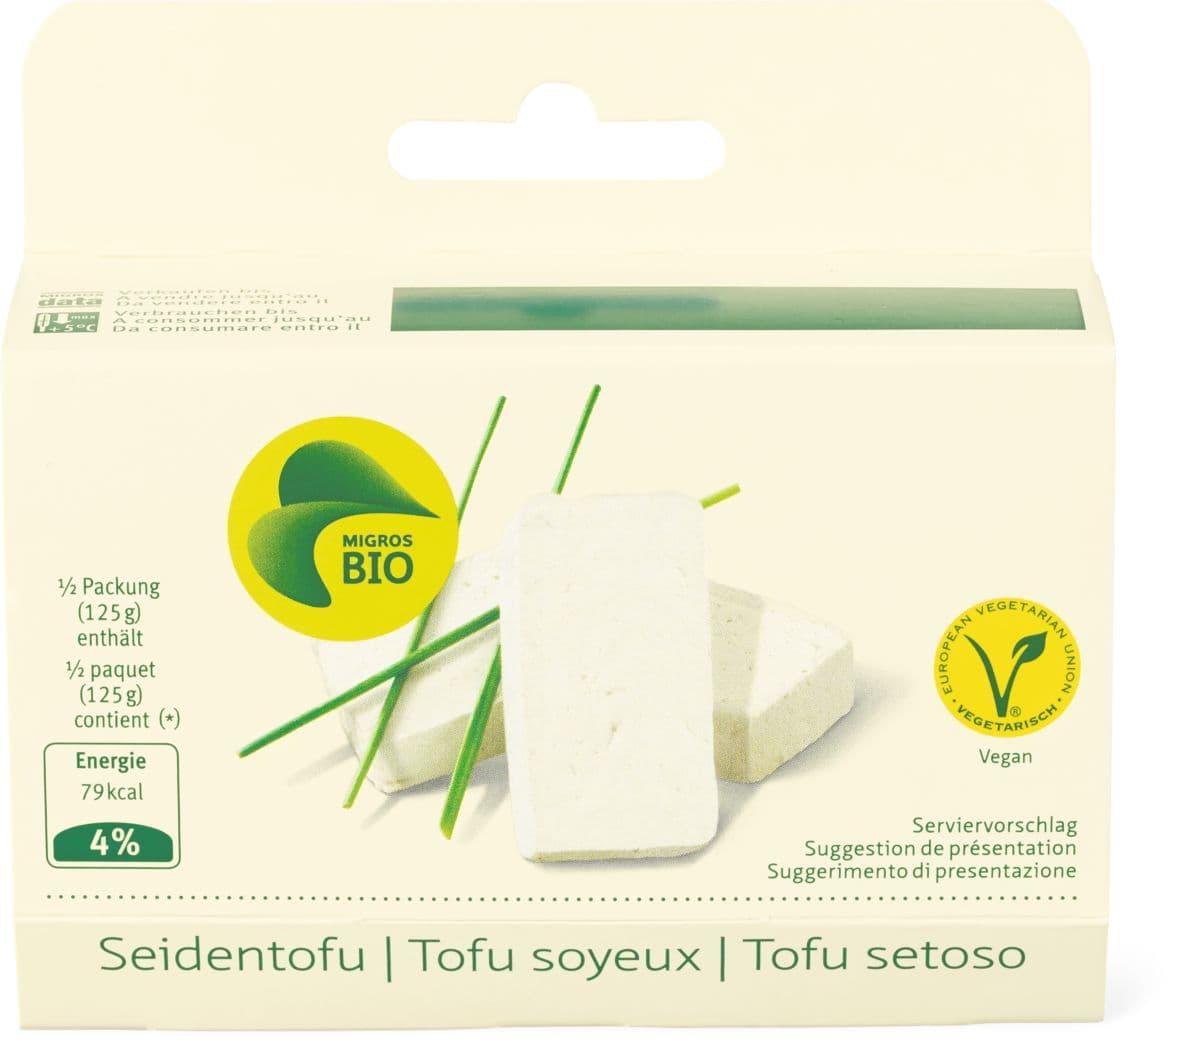 Bio Tofu soyeux